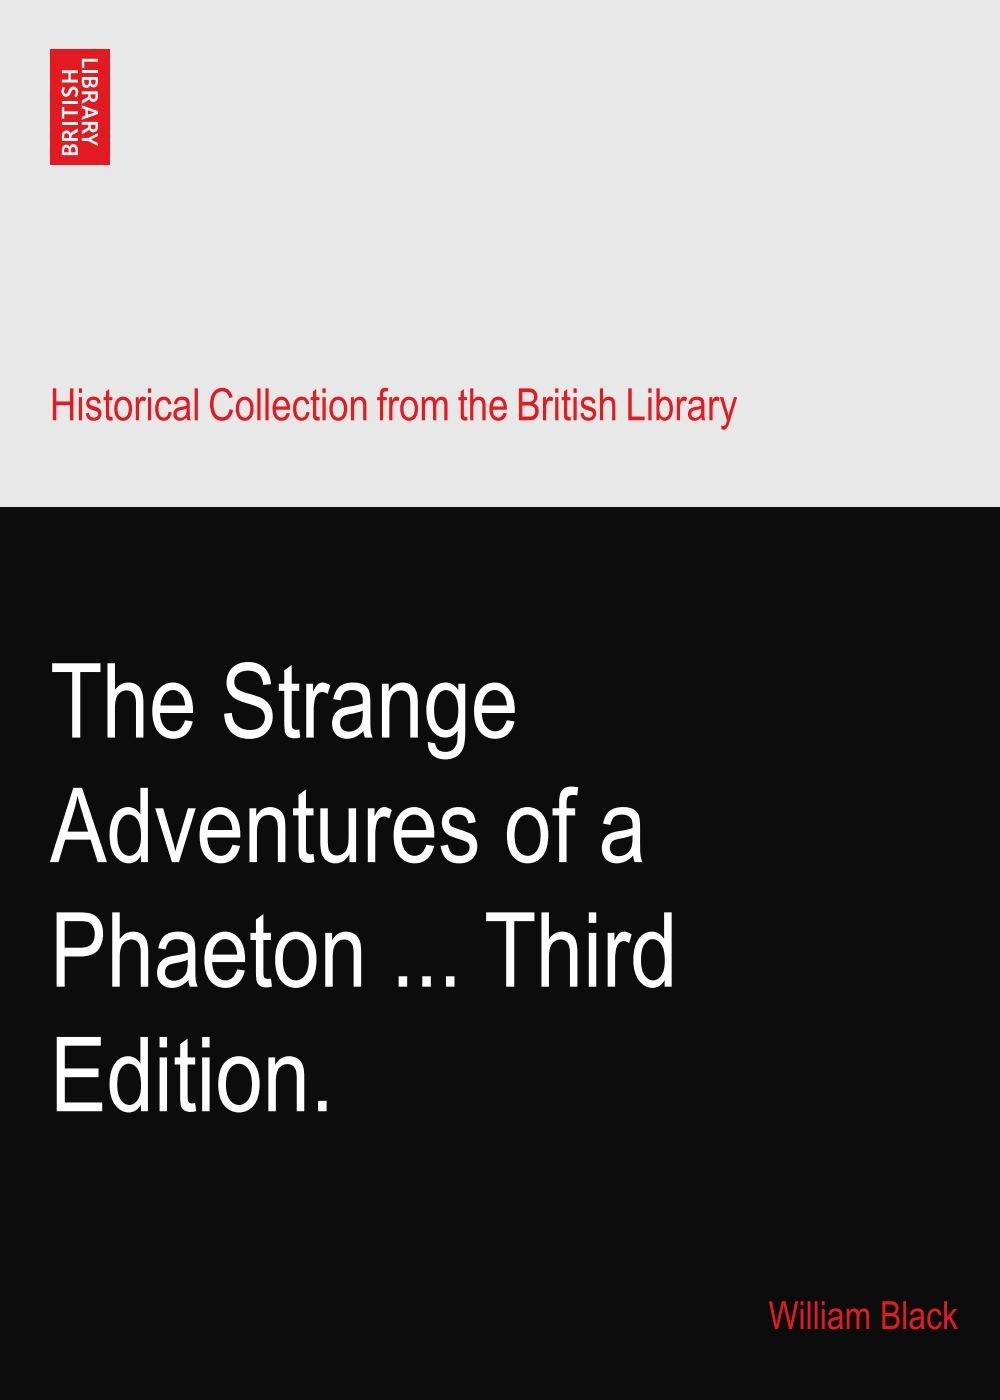 The Strange Adventures of a Phaeton ... Third Edition. pdf